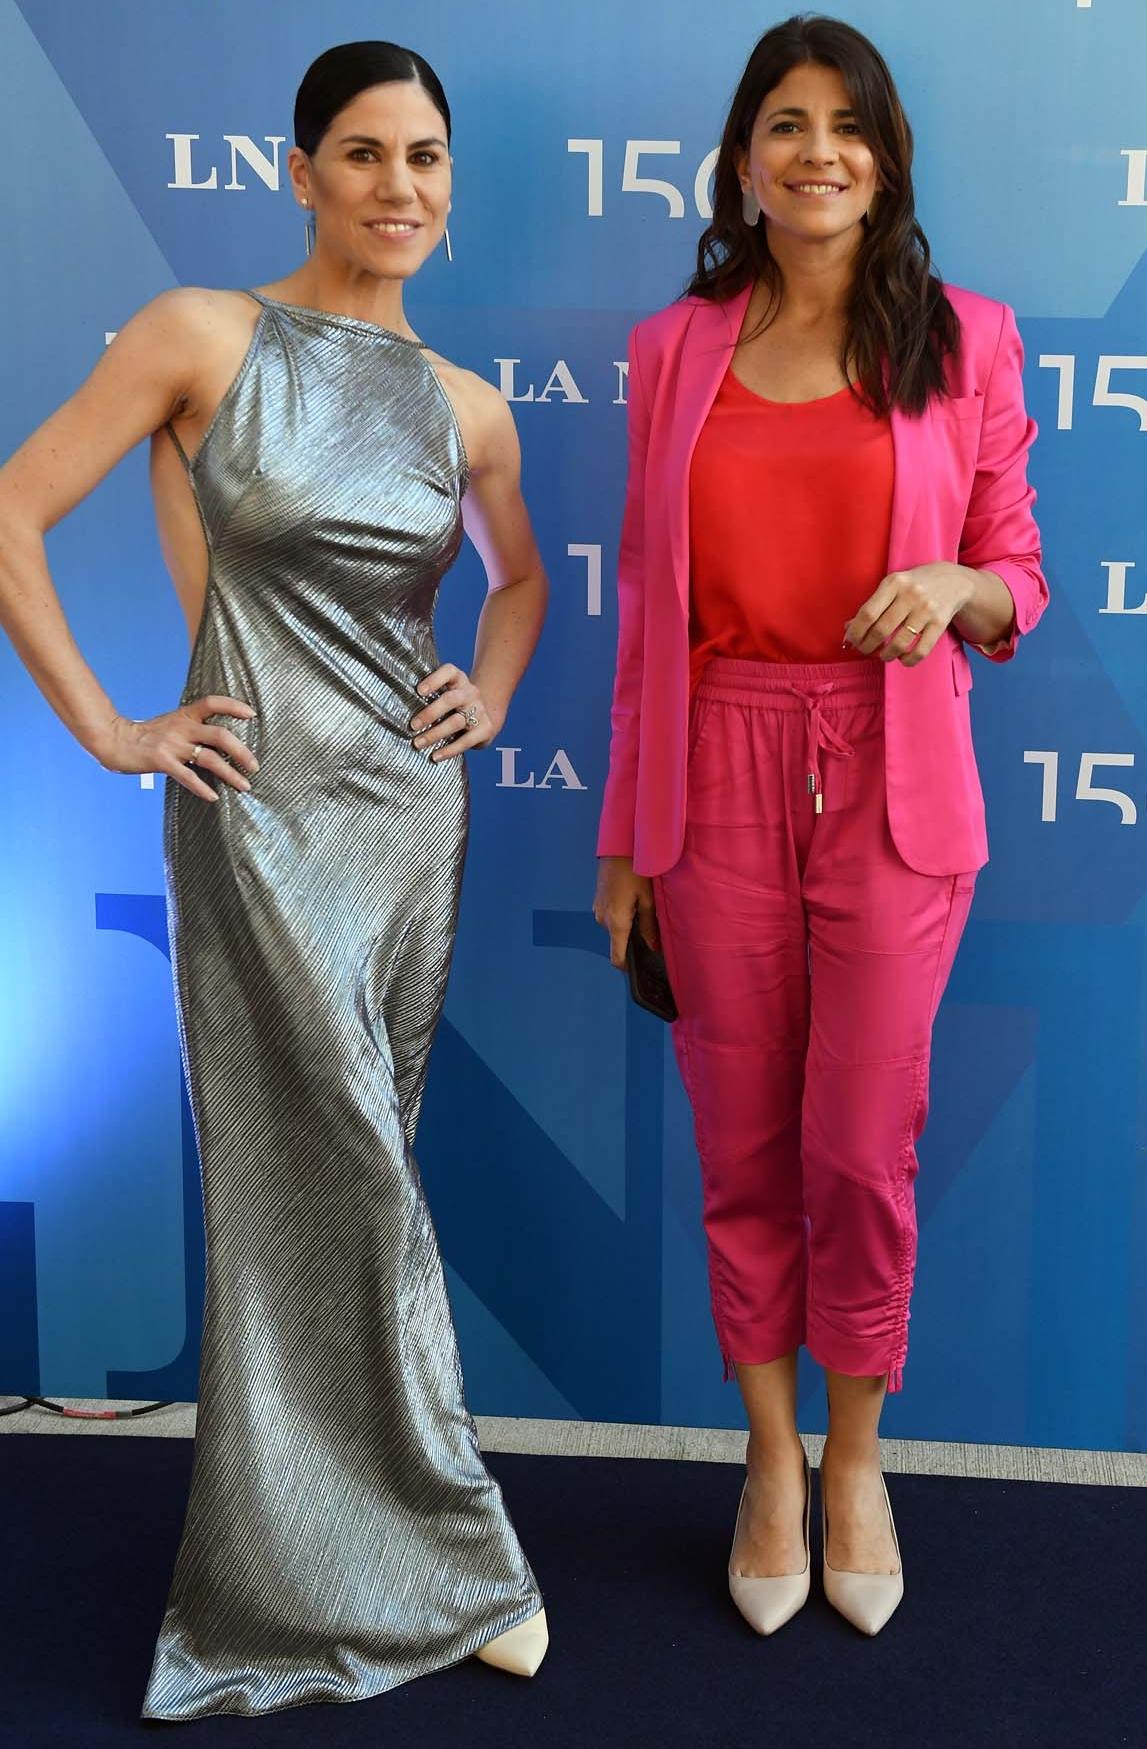 Paloma Herrera y Eleonora Cole